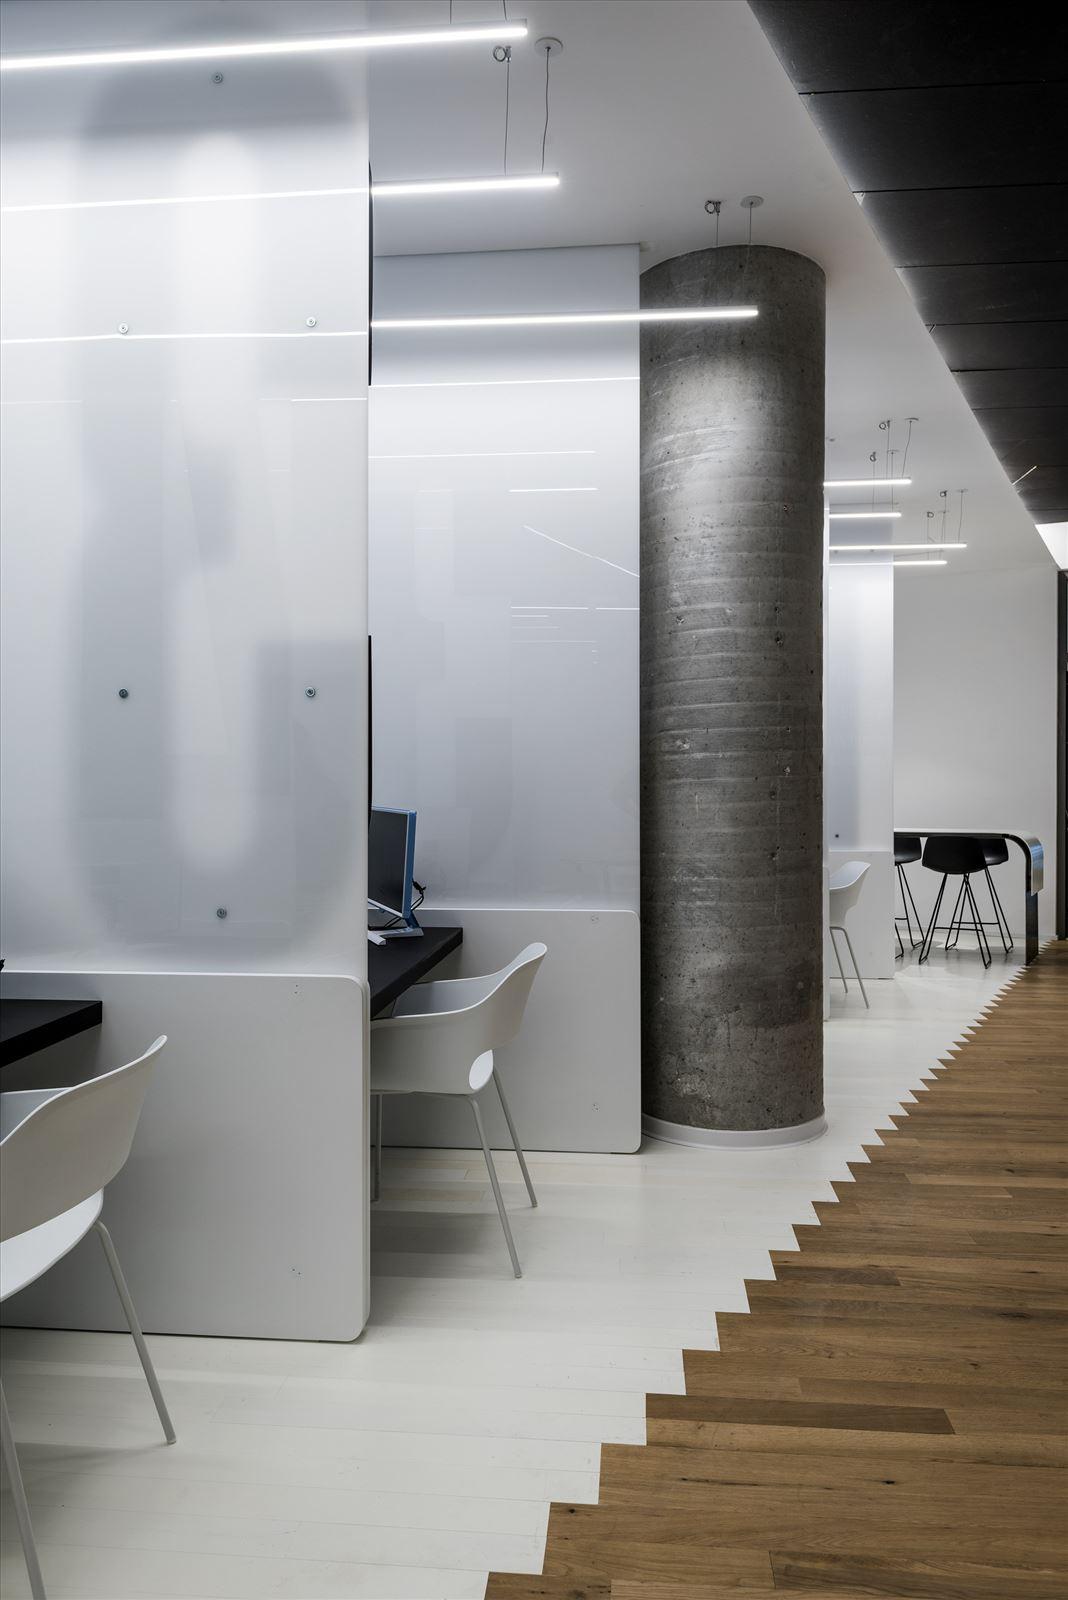 Office lighting project תאורה בכל עמדות העבודה במשרד - דורי קמחי